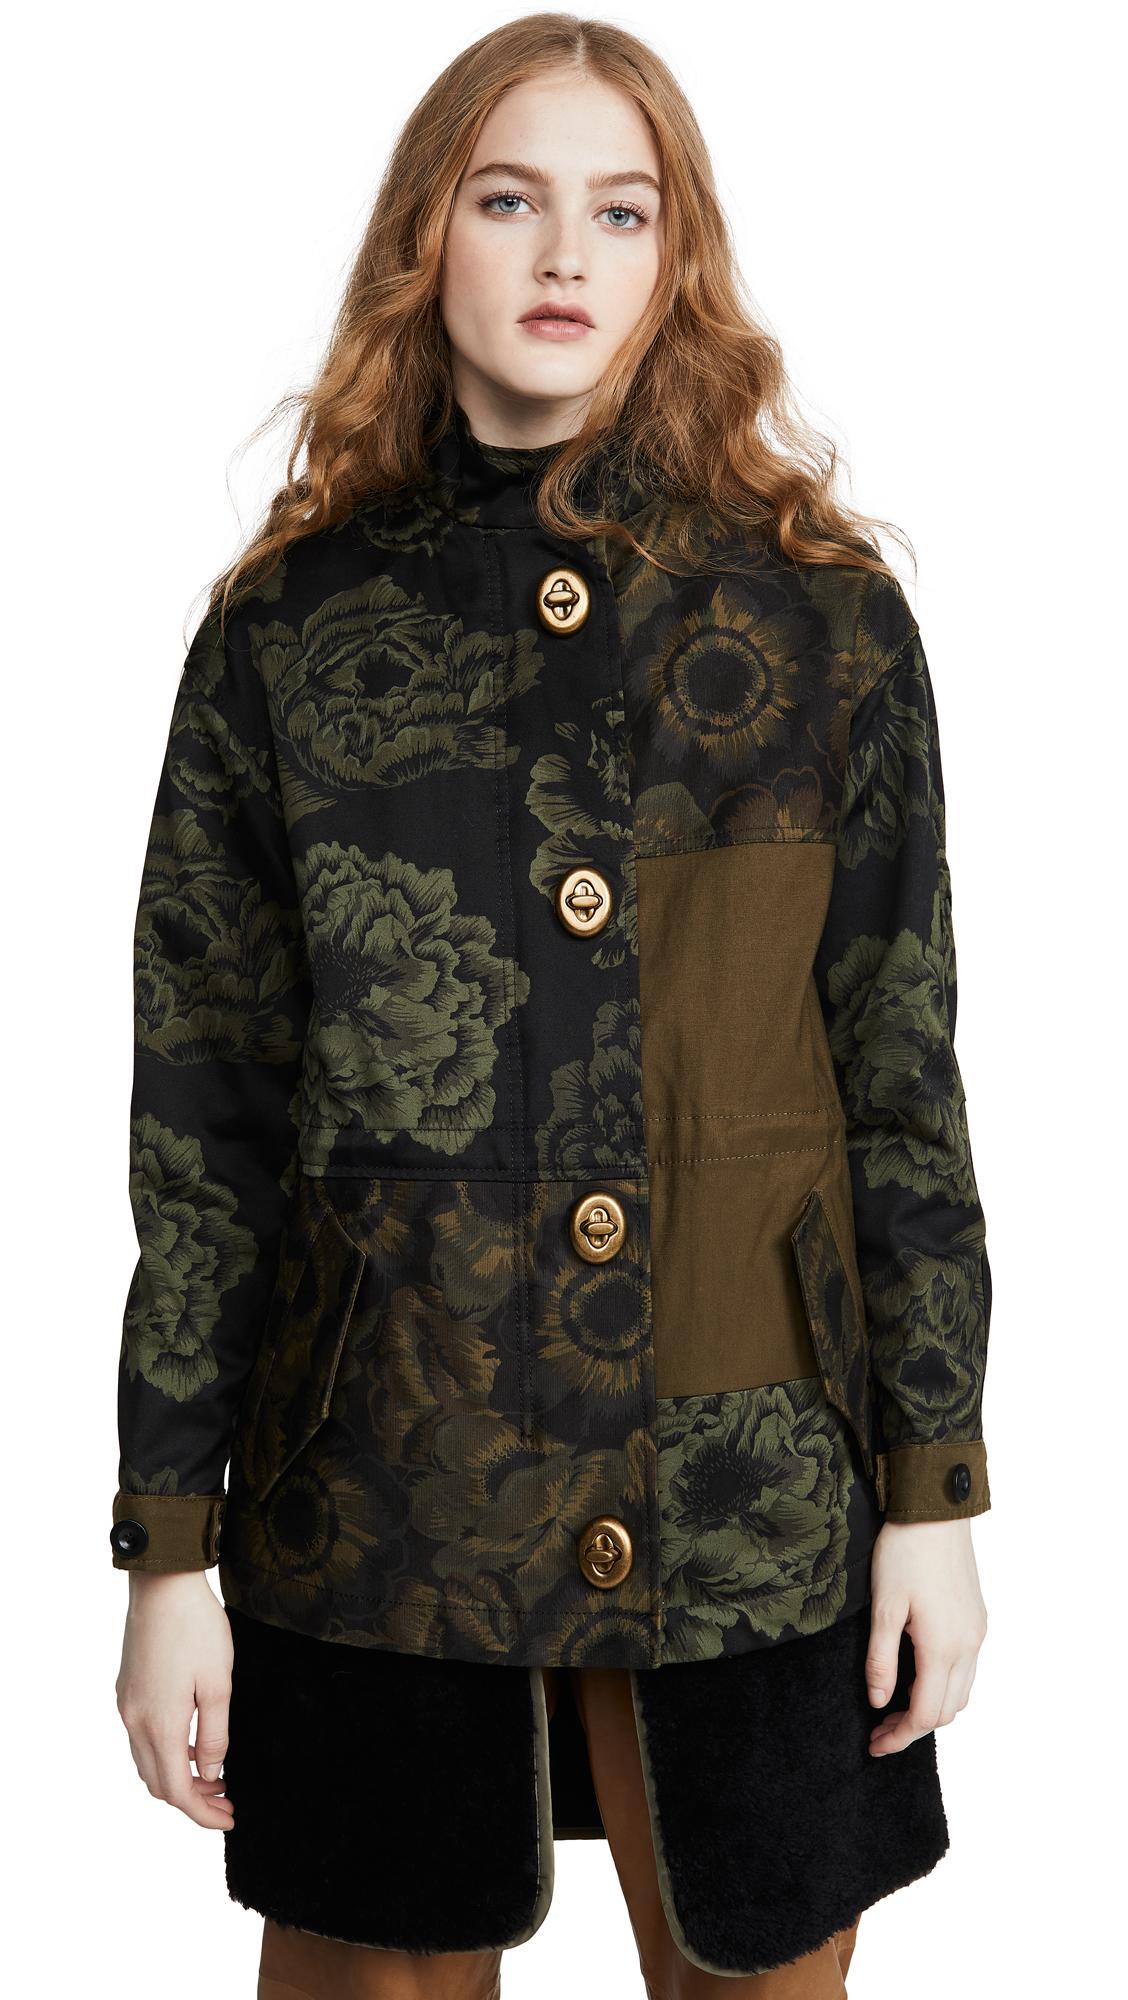 Buy Coach 1941 Patchwork Parka online beautiful Coach Jackets, Coats, Coats